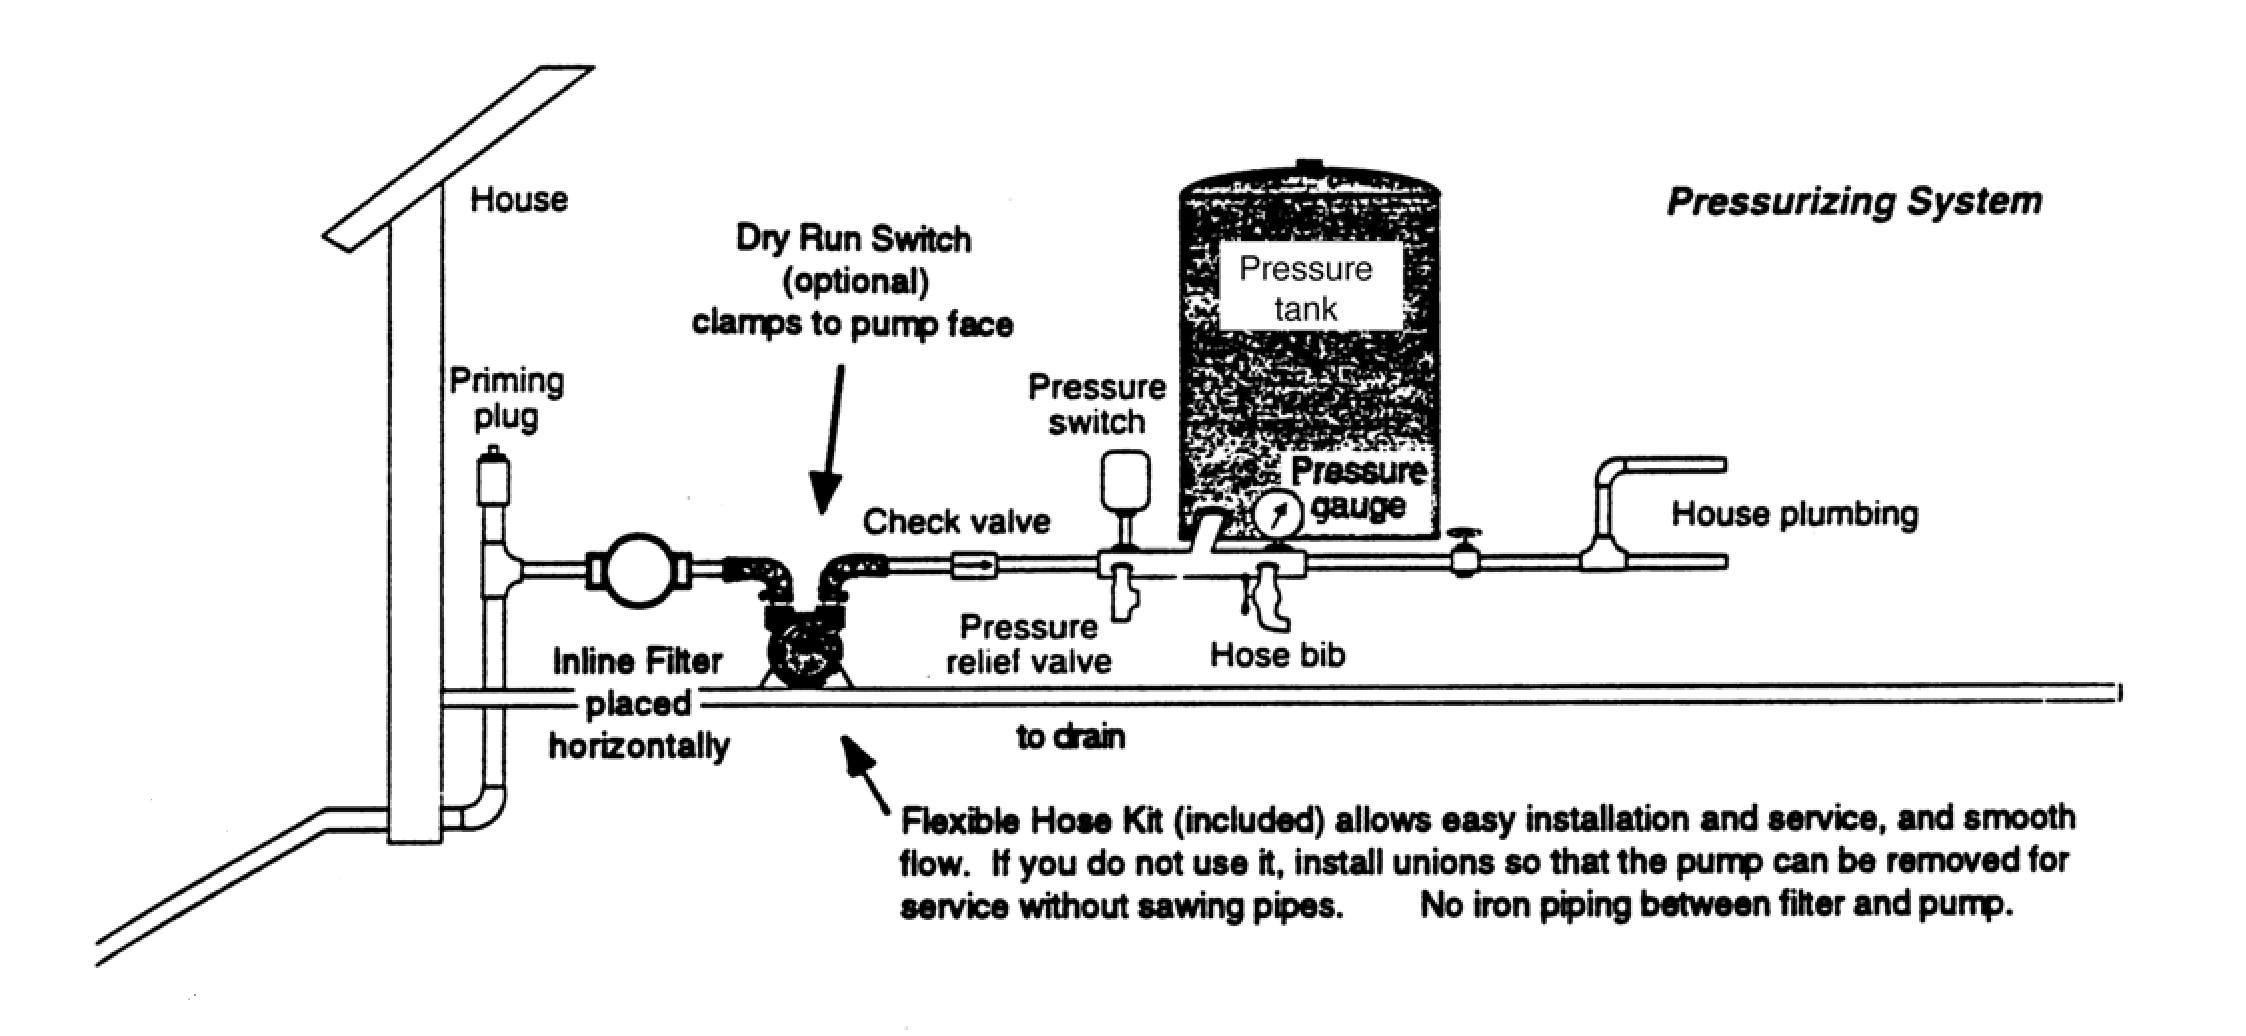 Funky Boiler Piping Layout Festooning - Electrical Circuit Diagram ...